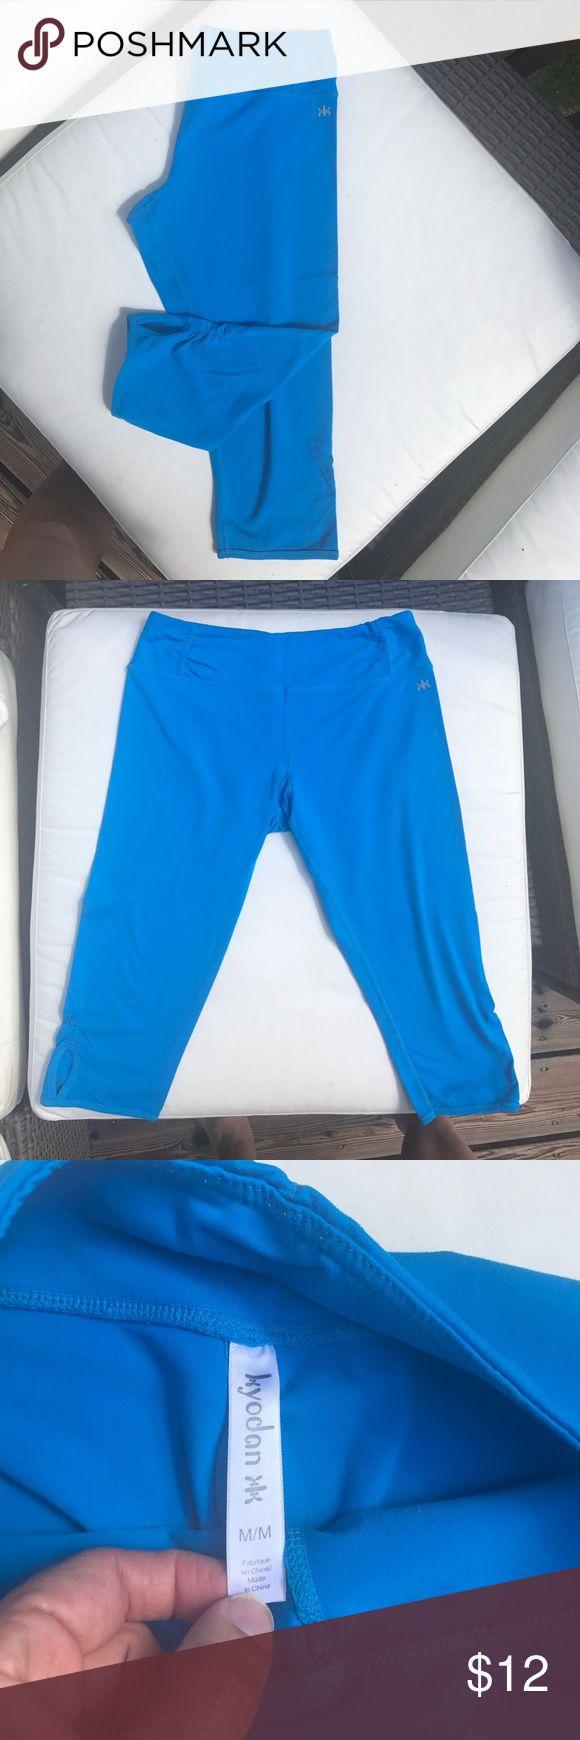 Electric blue crop yoga pant. - kyodan Great condition, electric blue calf length yoga pant. Cute keyhole detail on legs. Kyodan Pants Leggings